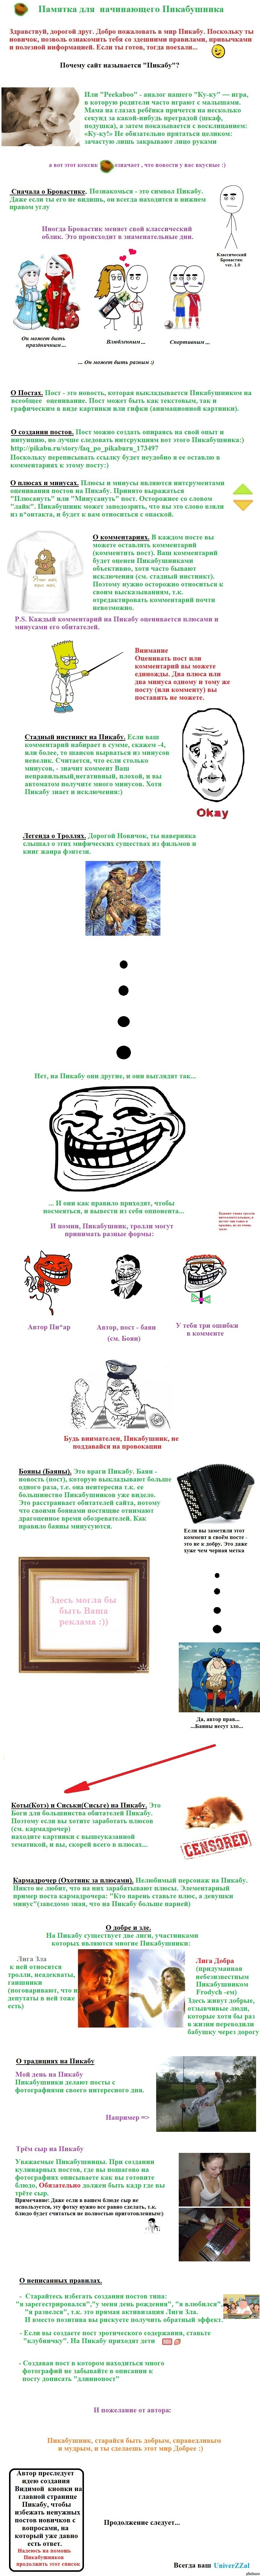 ������� ��� ����������� ����������� ��������! ����� ������ ��� ����������, ��� ������� ����, ��������� �������� �.�.�. http://apikabu.ru/img_n/2012-10_6/39w.jpg